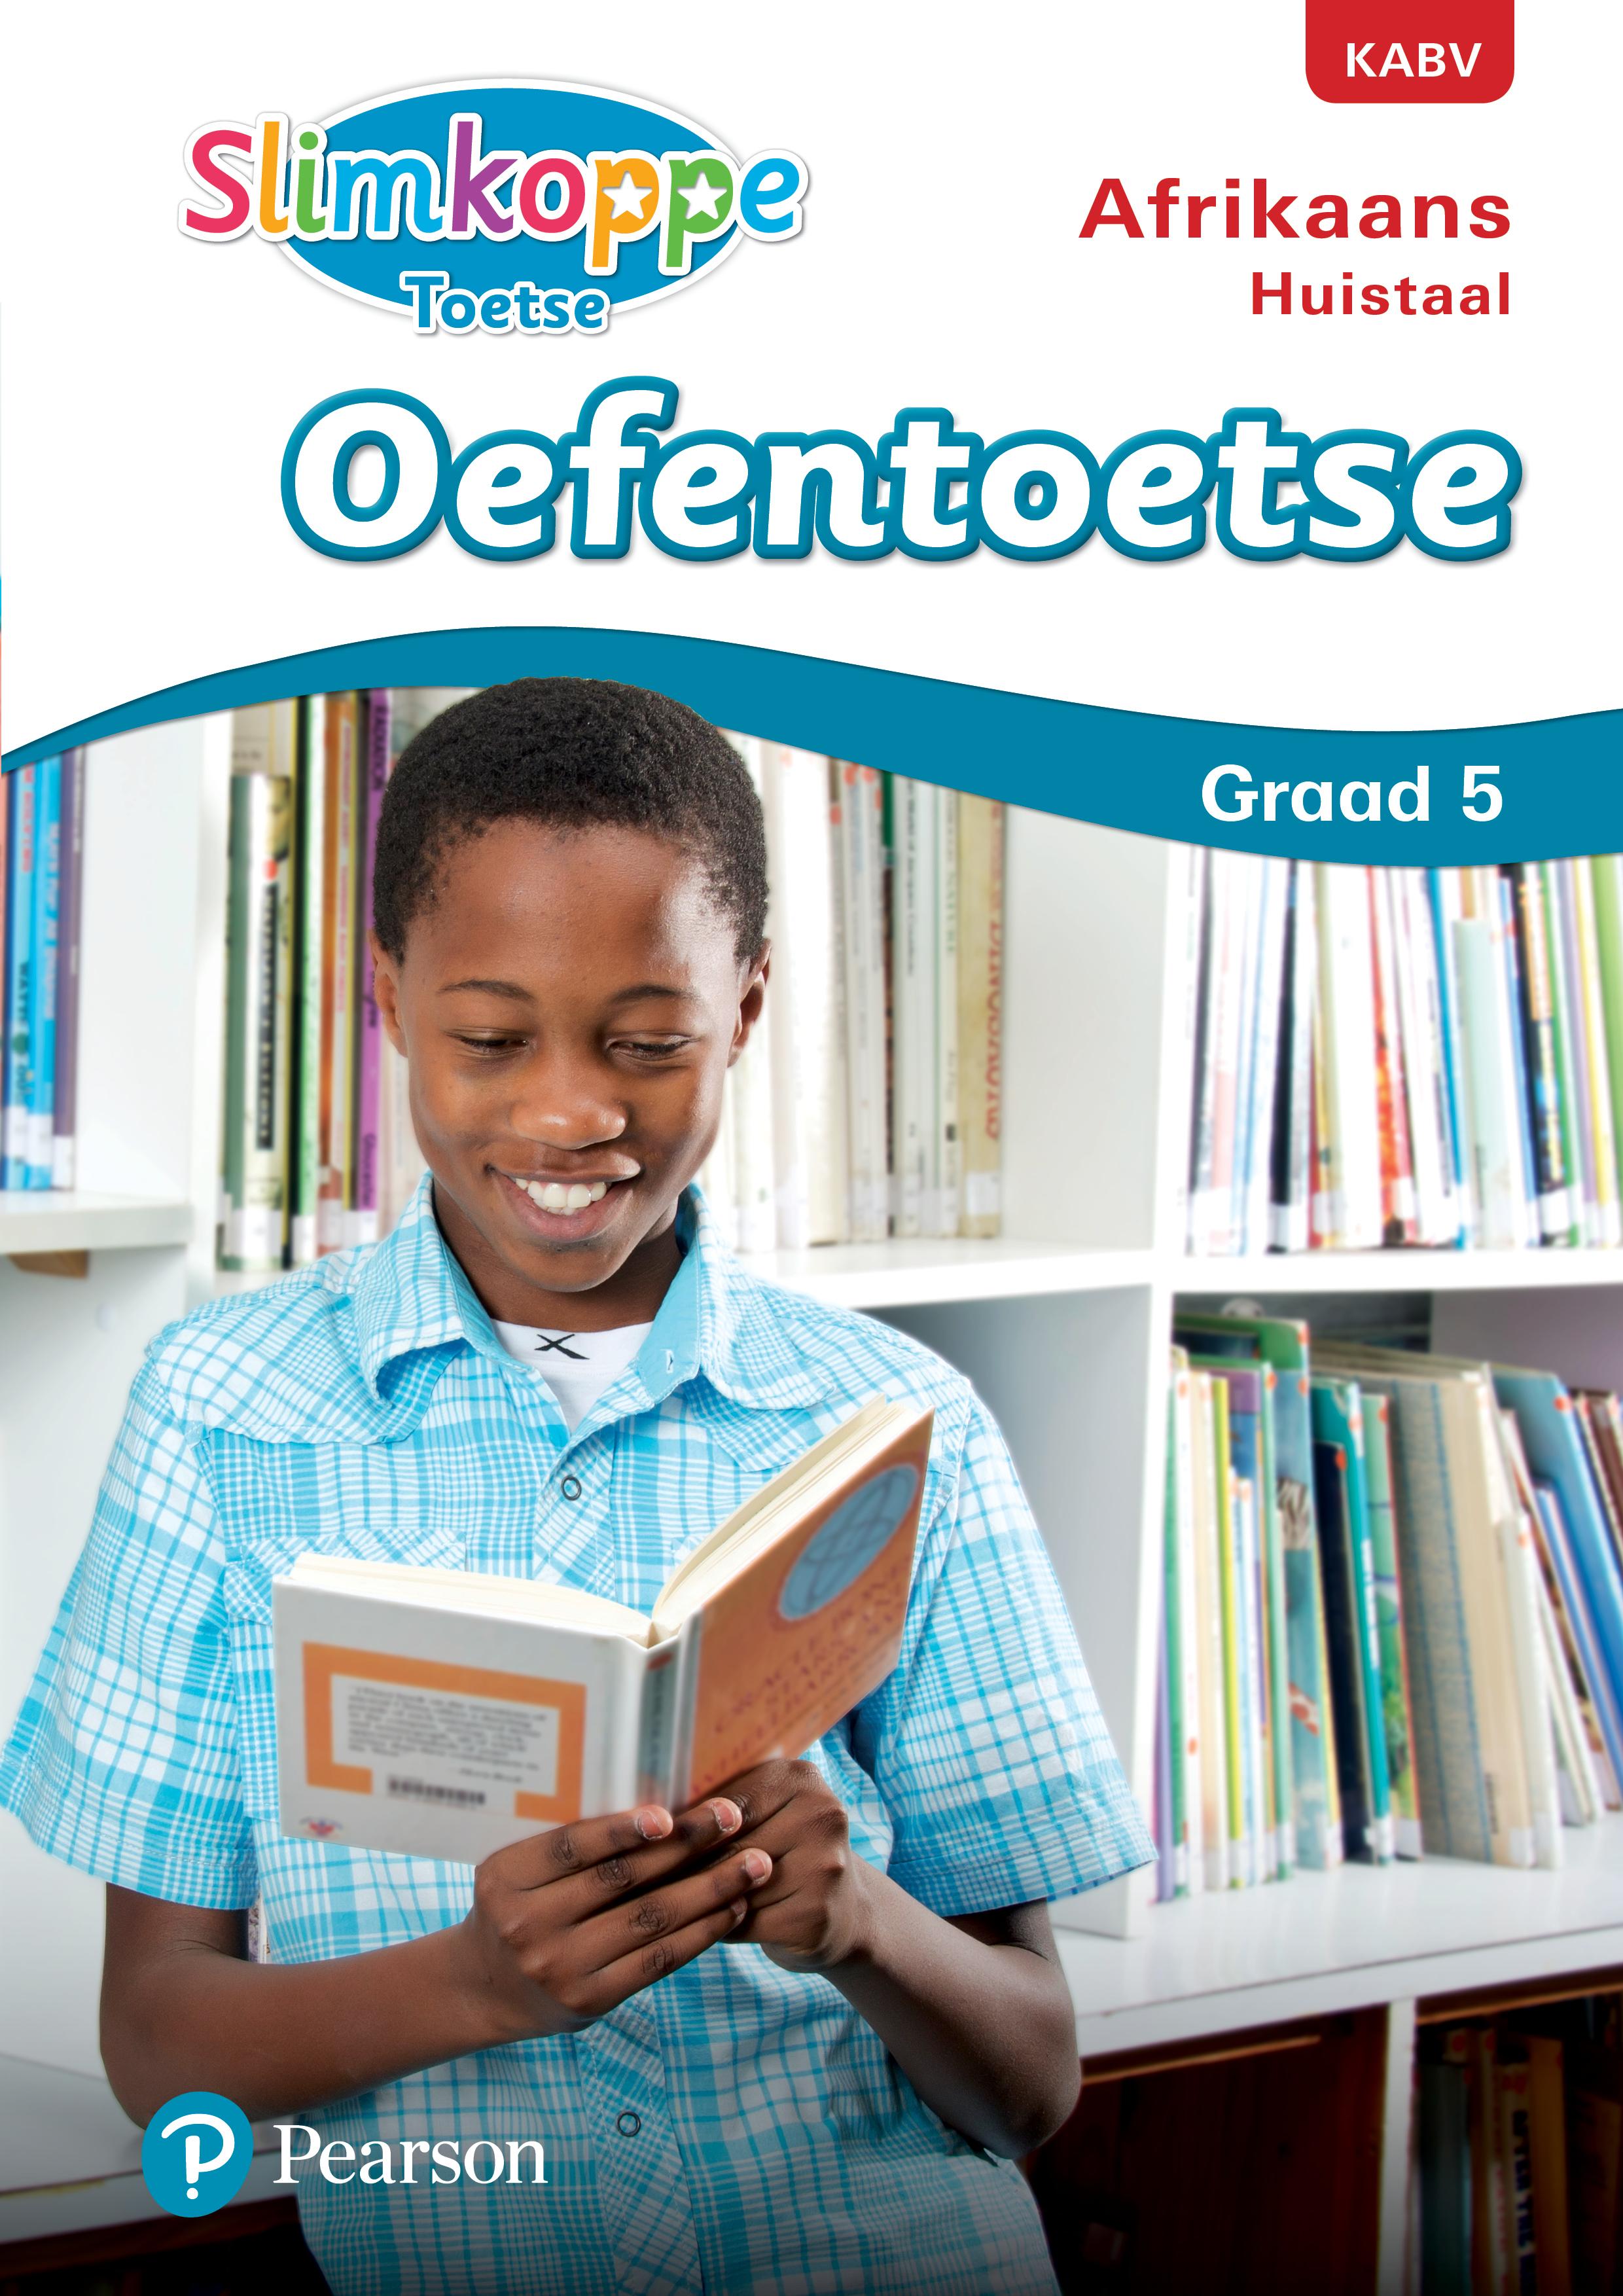 Picture of Slimkoppe Toetse: Afrikaans Huistaal: Grade 5: Oefentoetse